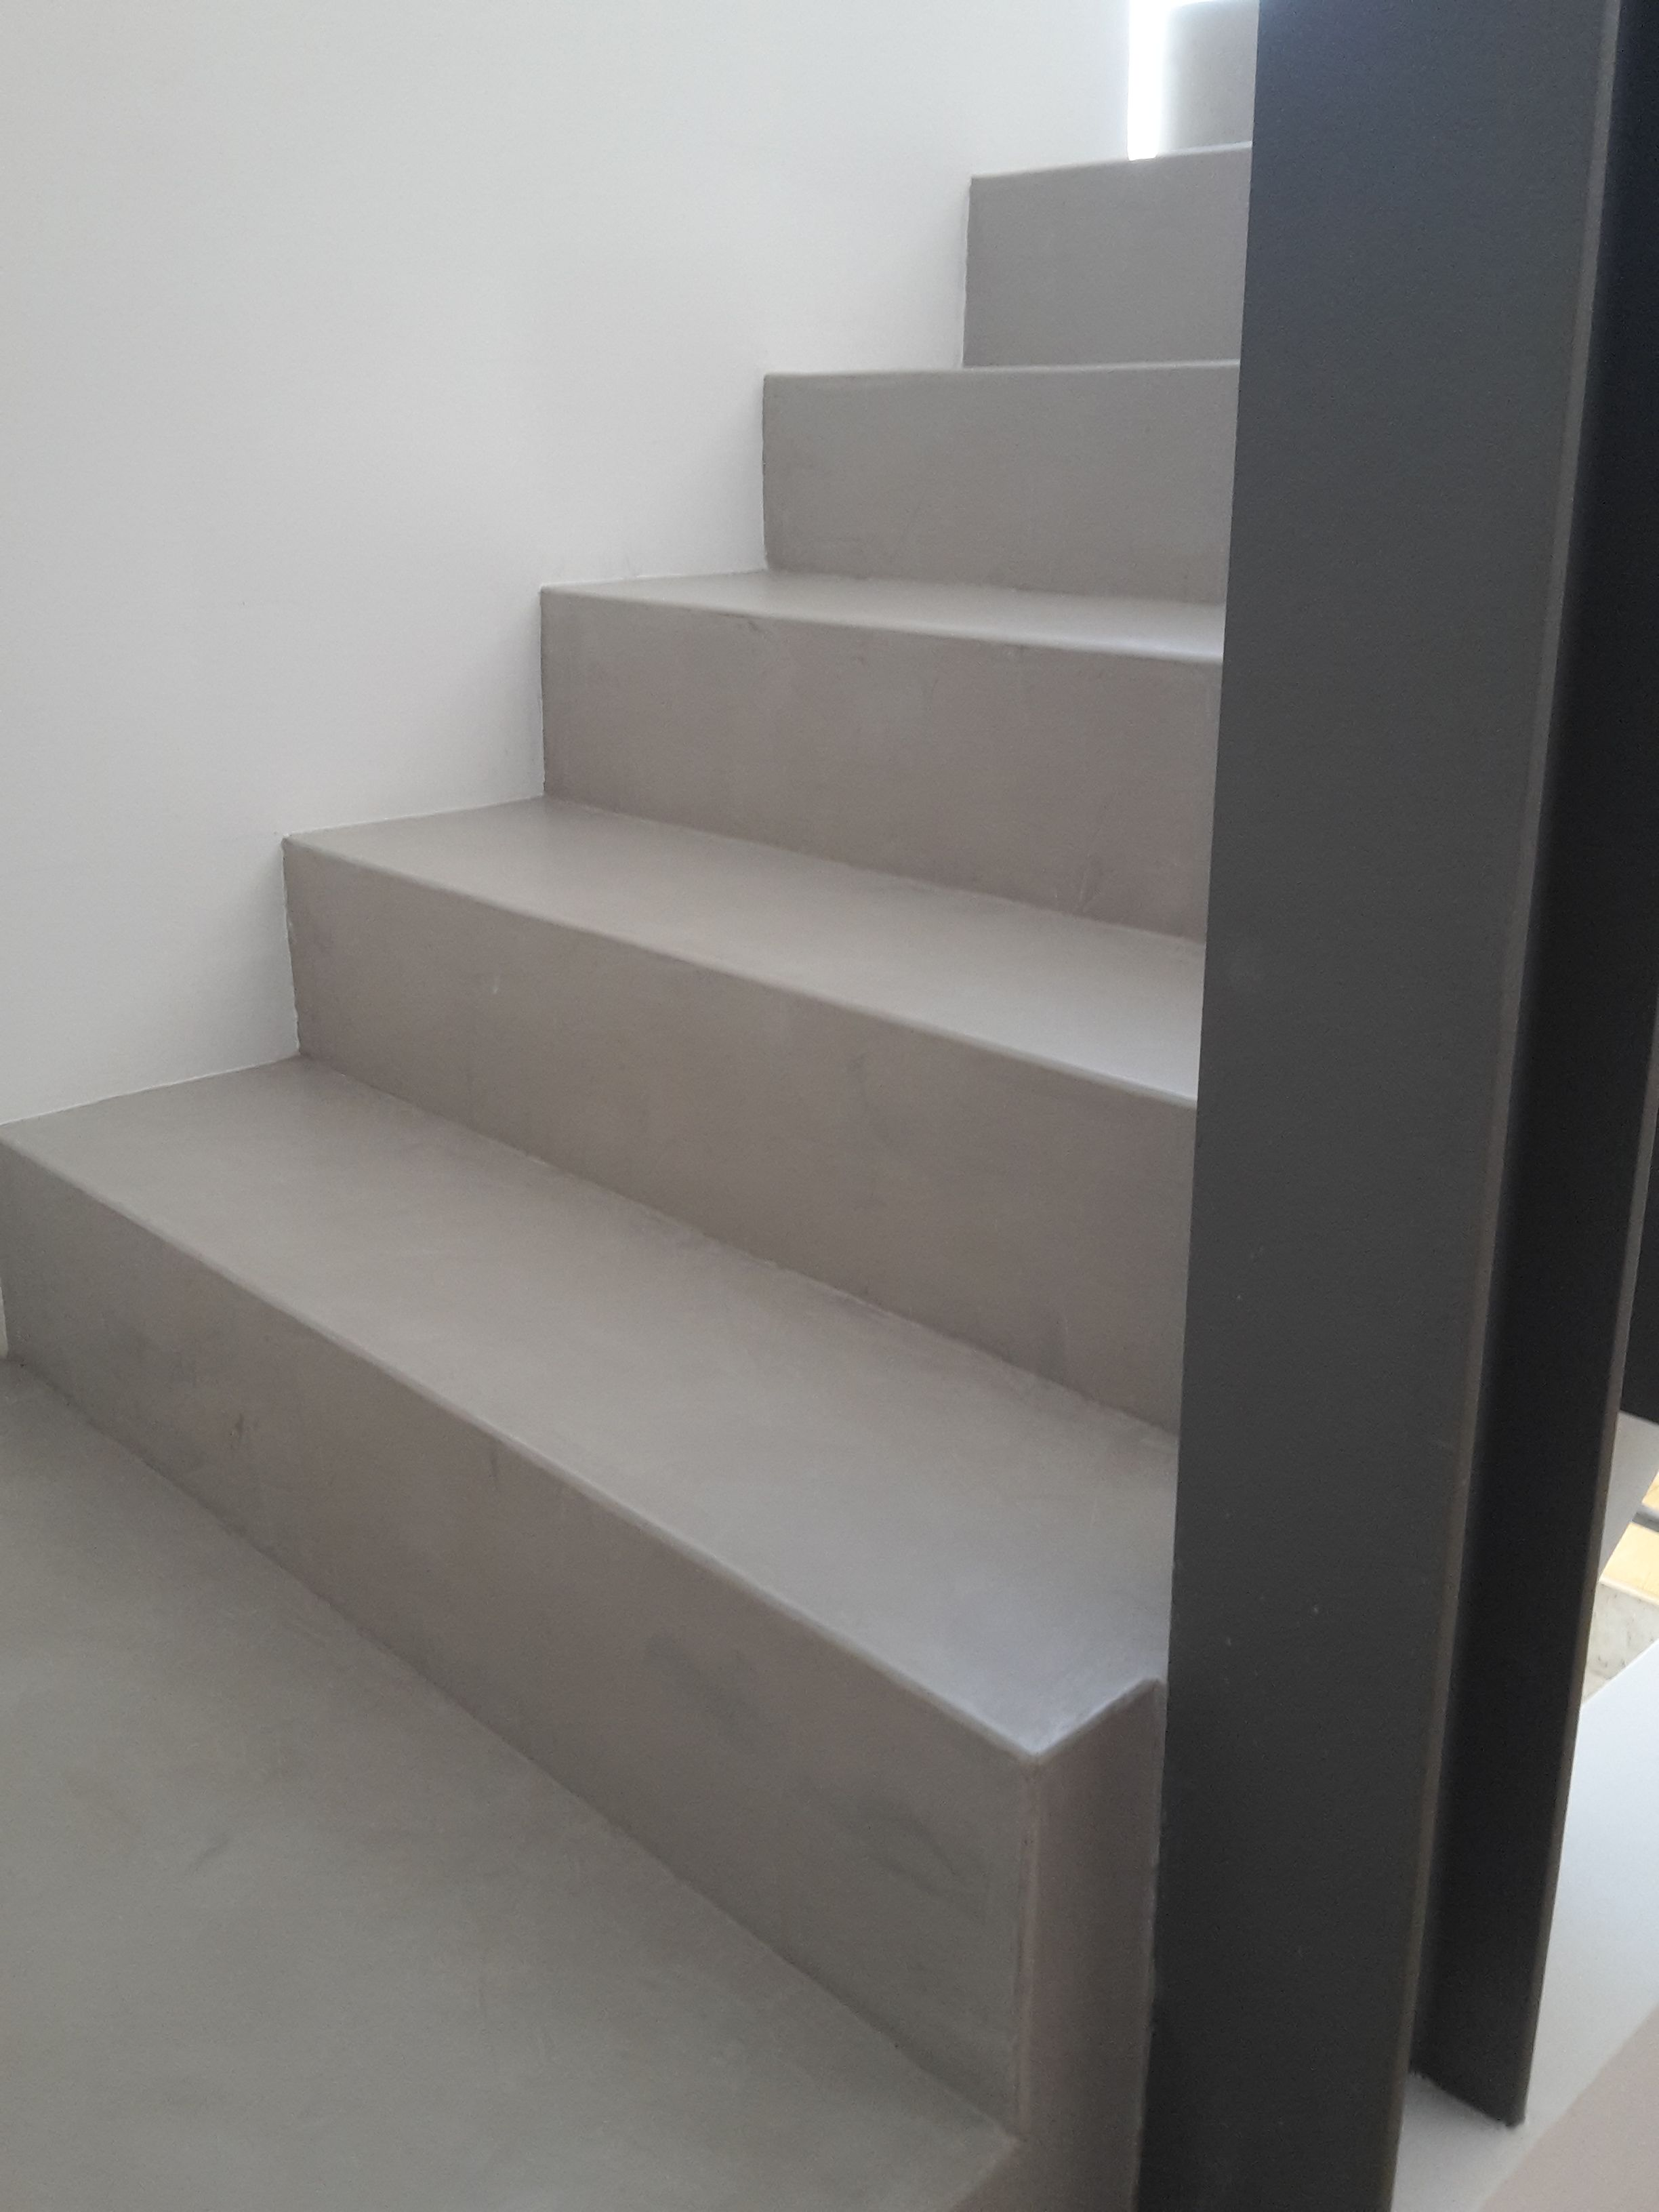 Exceptional Beton Cire Treppen Oberfläche